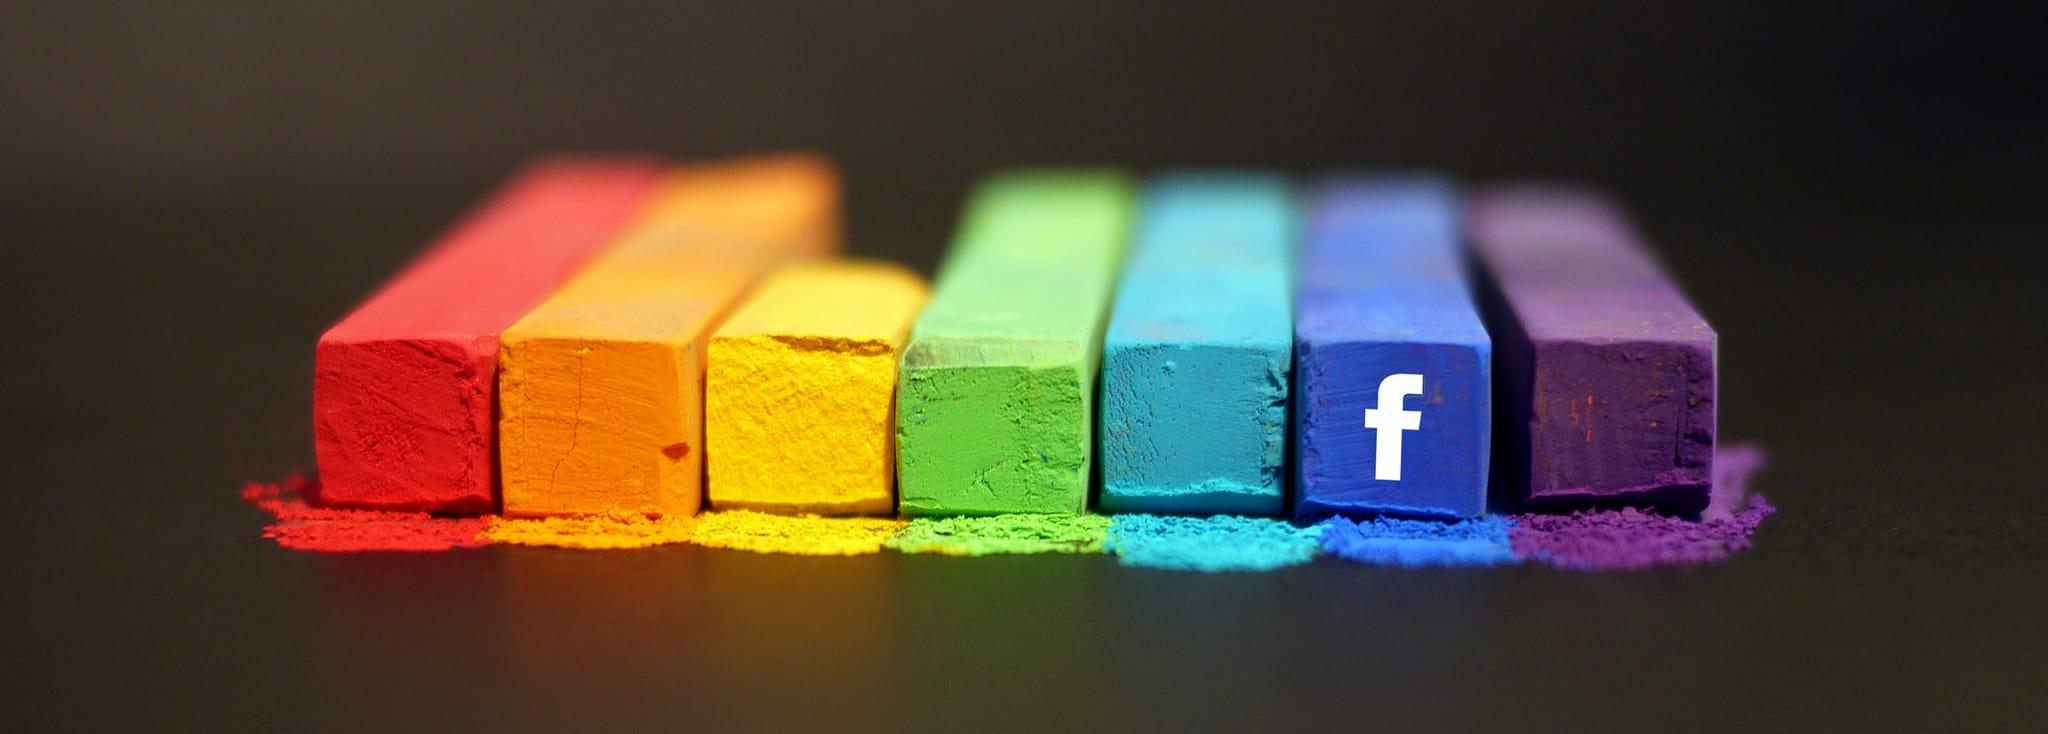 Social Media Intern Diaries: The Best Social Media Tools